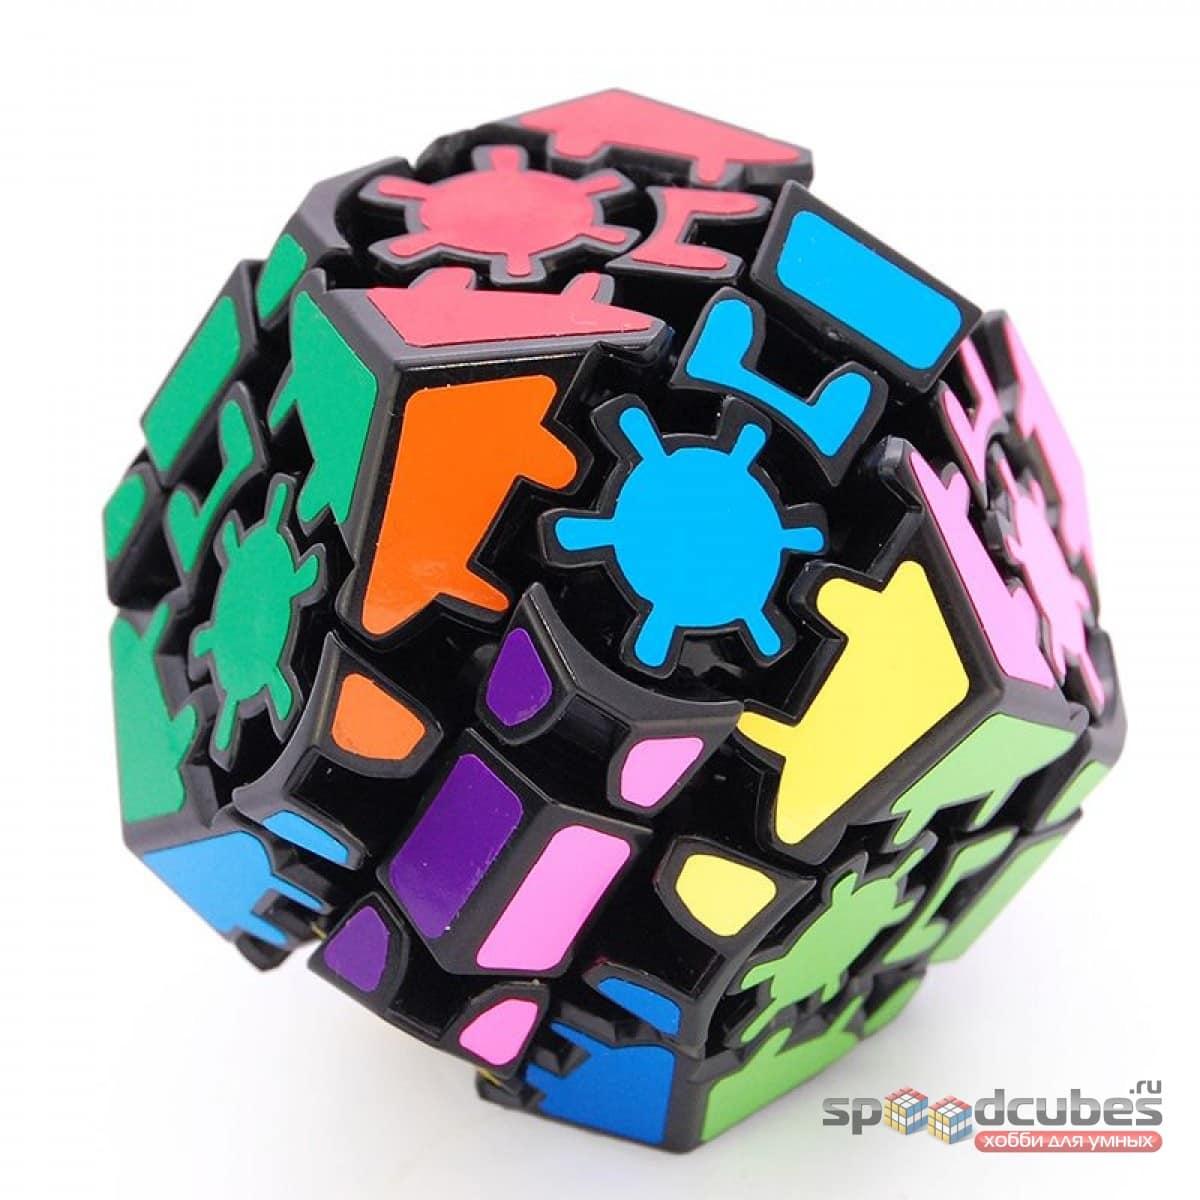 Lanlan Gear Dodecahedron 3